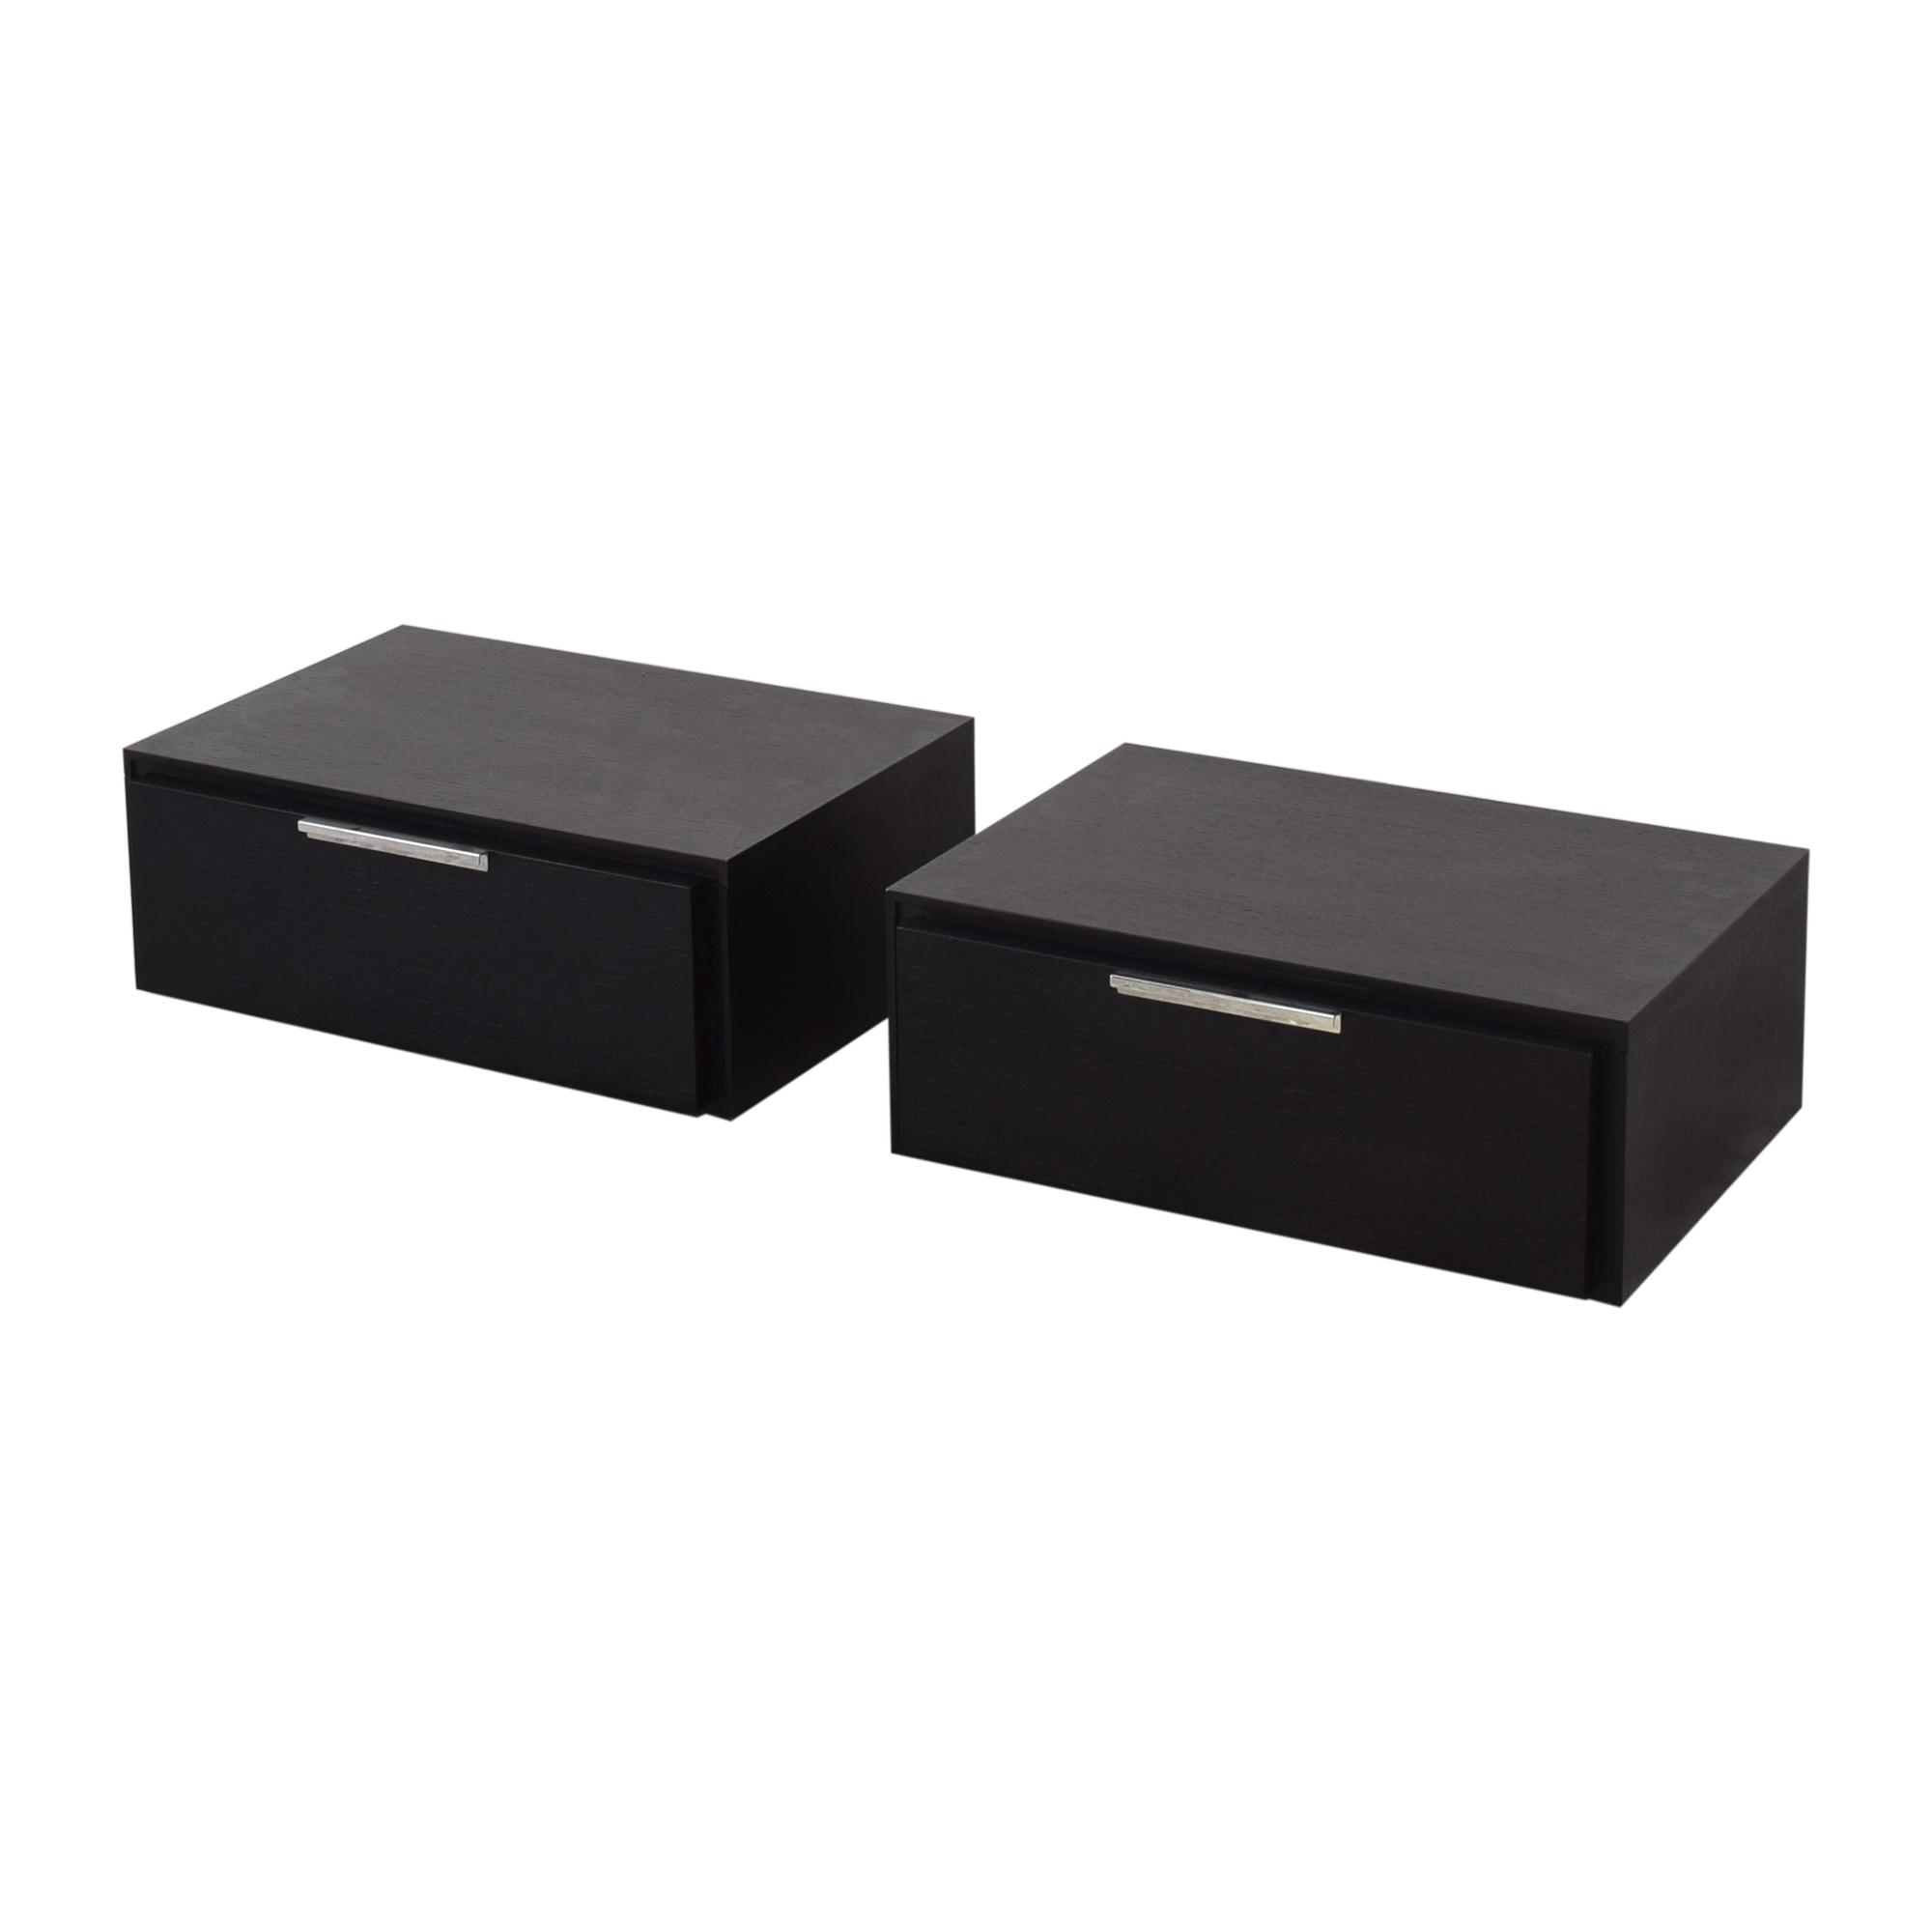 buy Modloft Thomspon Two-Drawer Nightstands Modloft End Tables